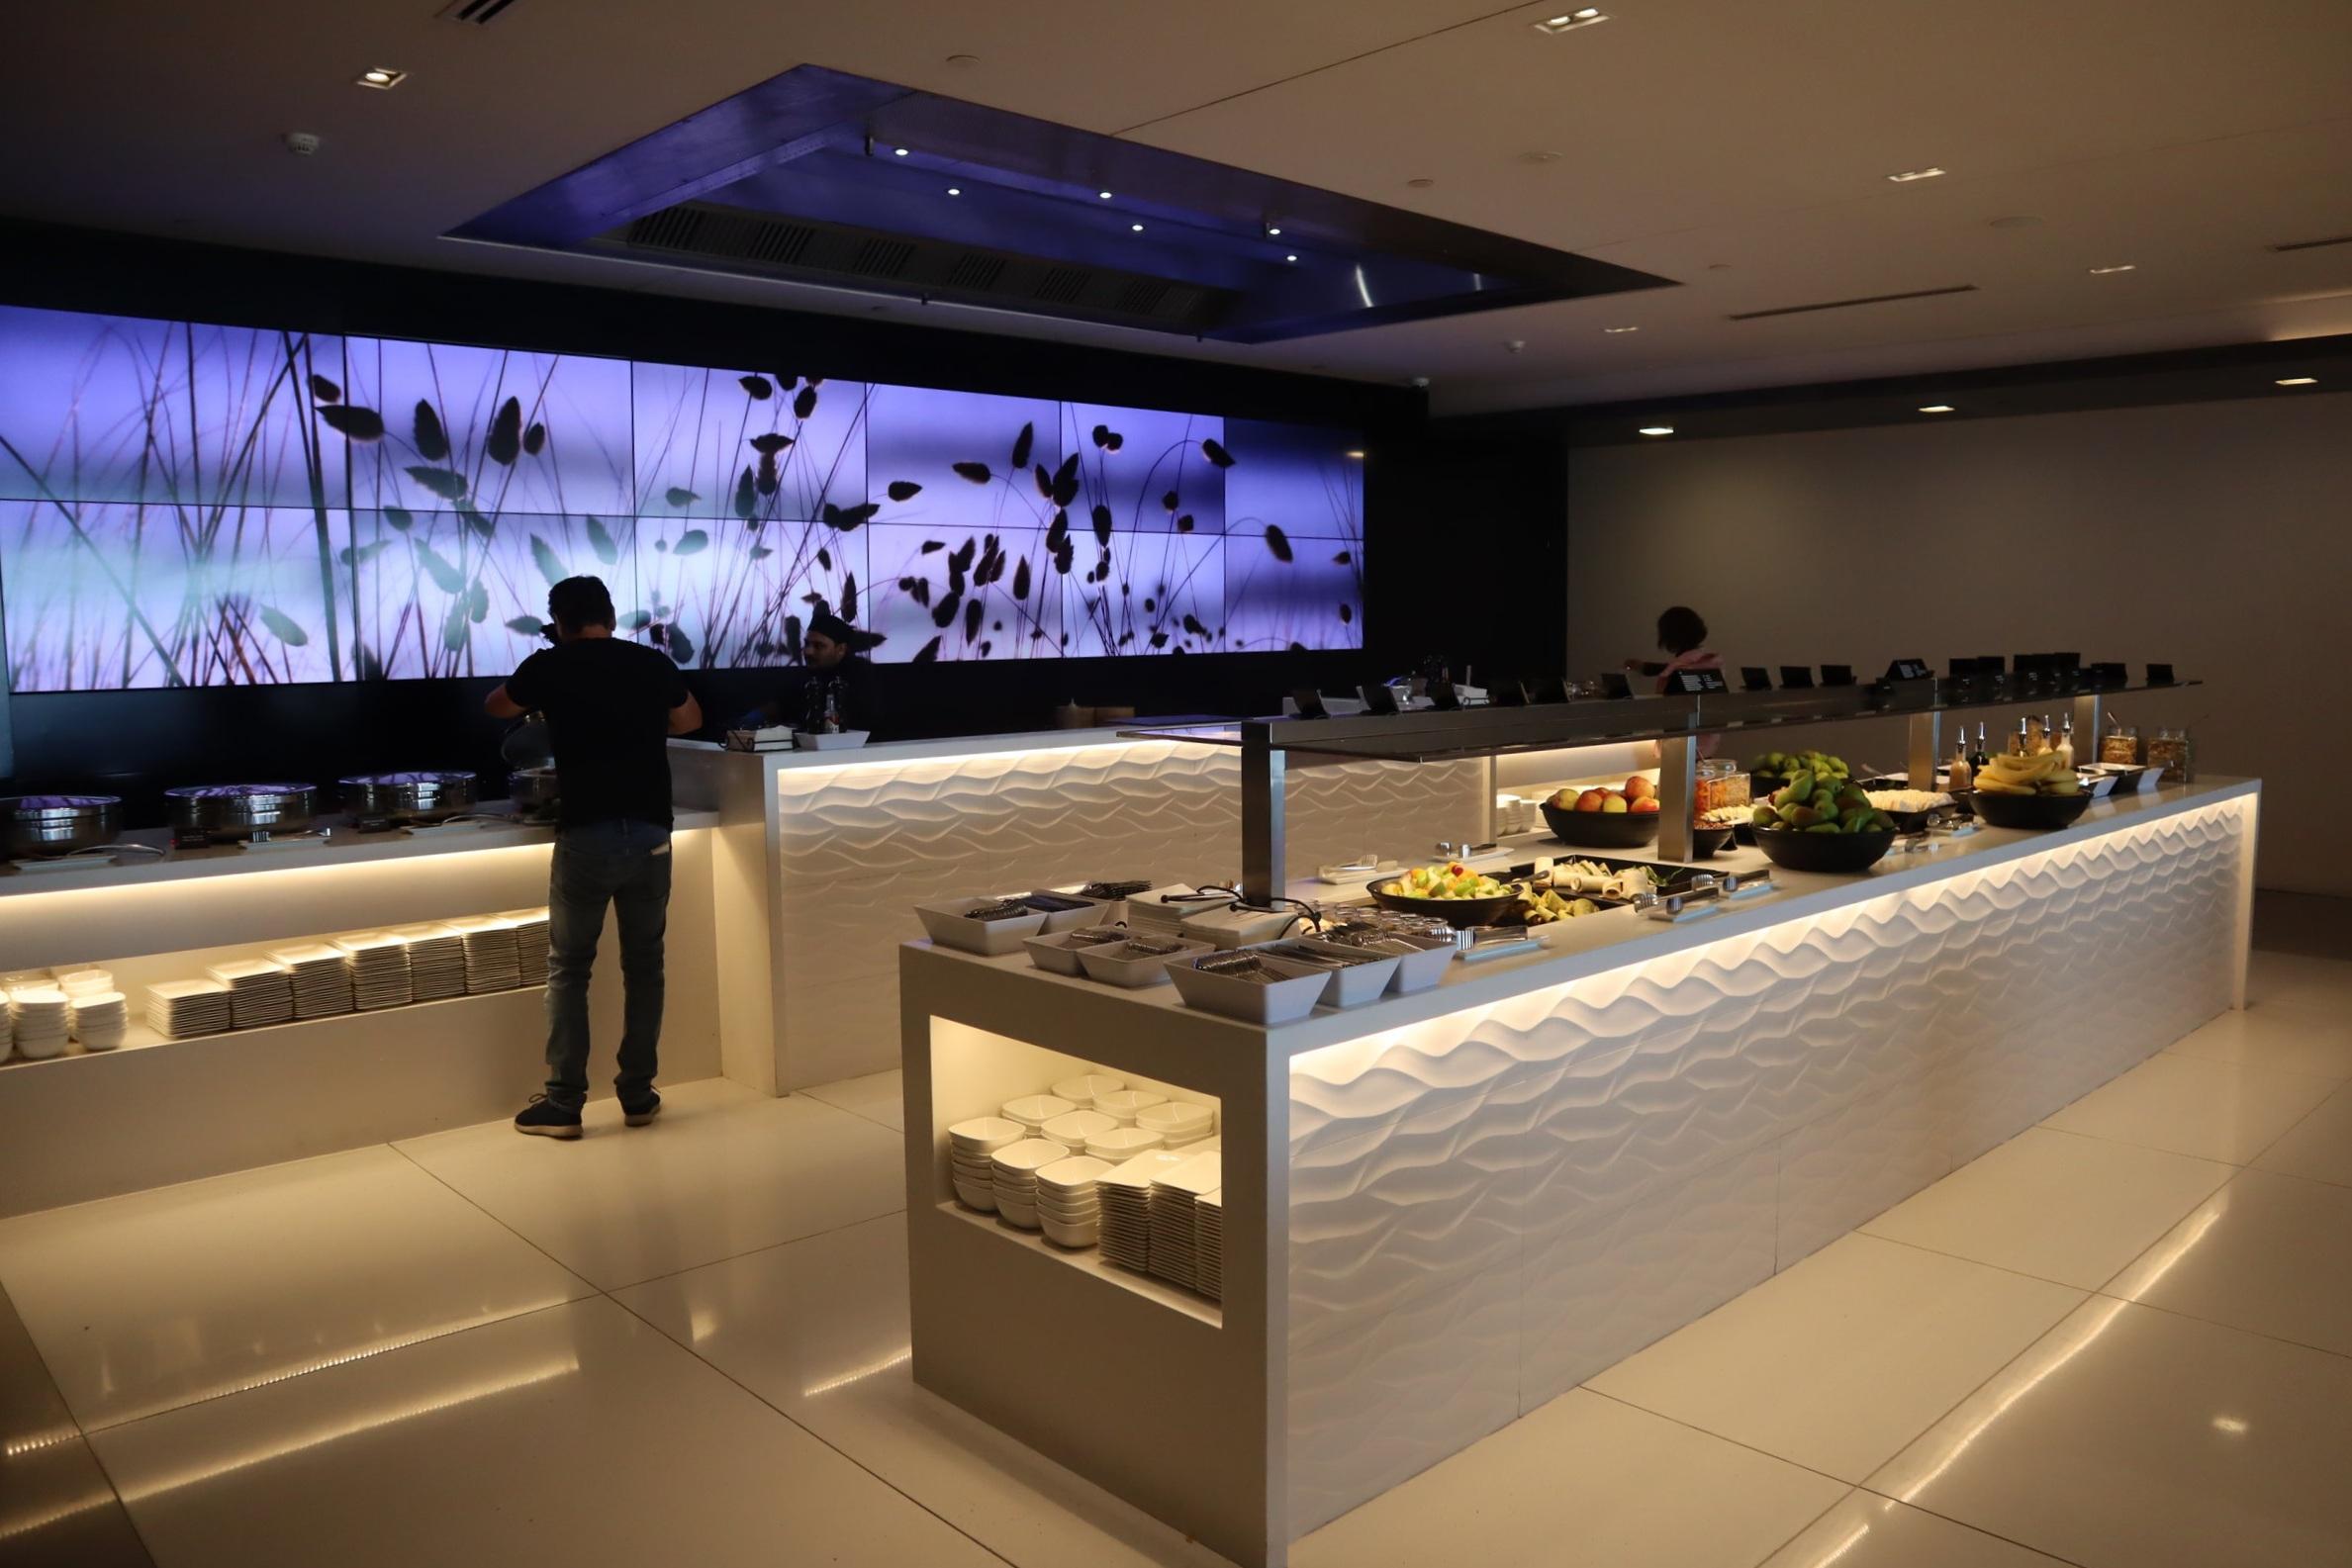 Air New Zealand Lounge Auckland – Buffet spread